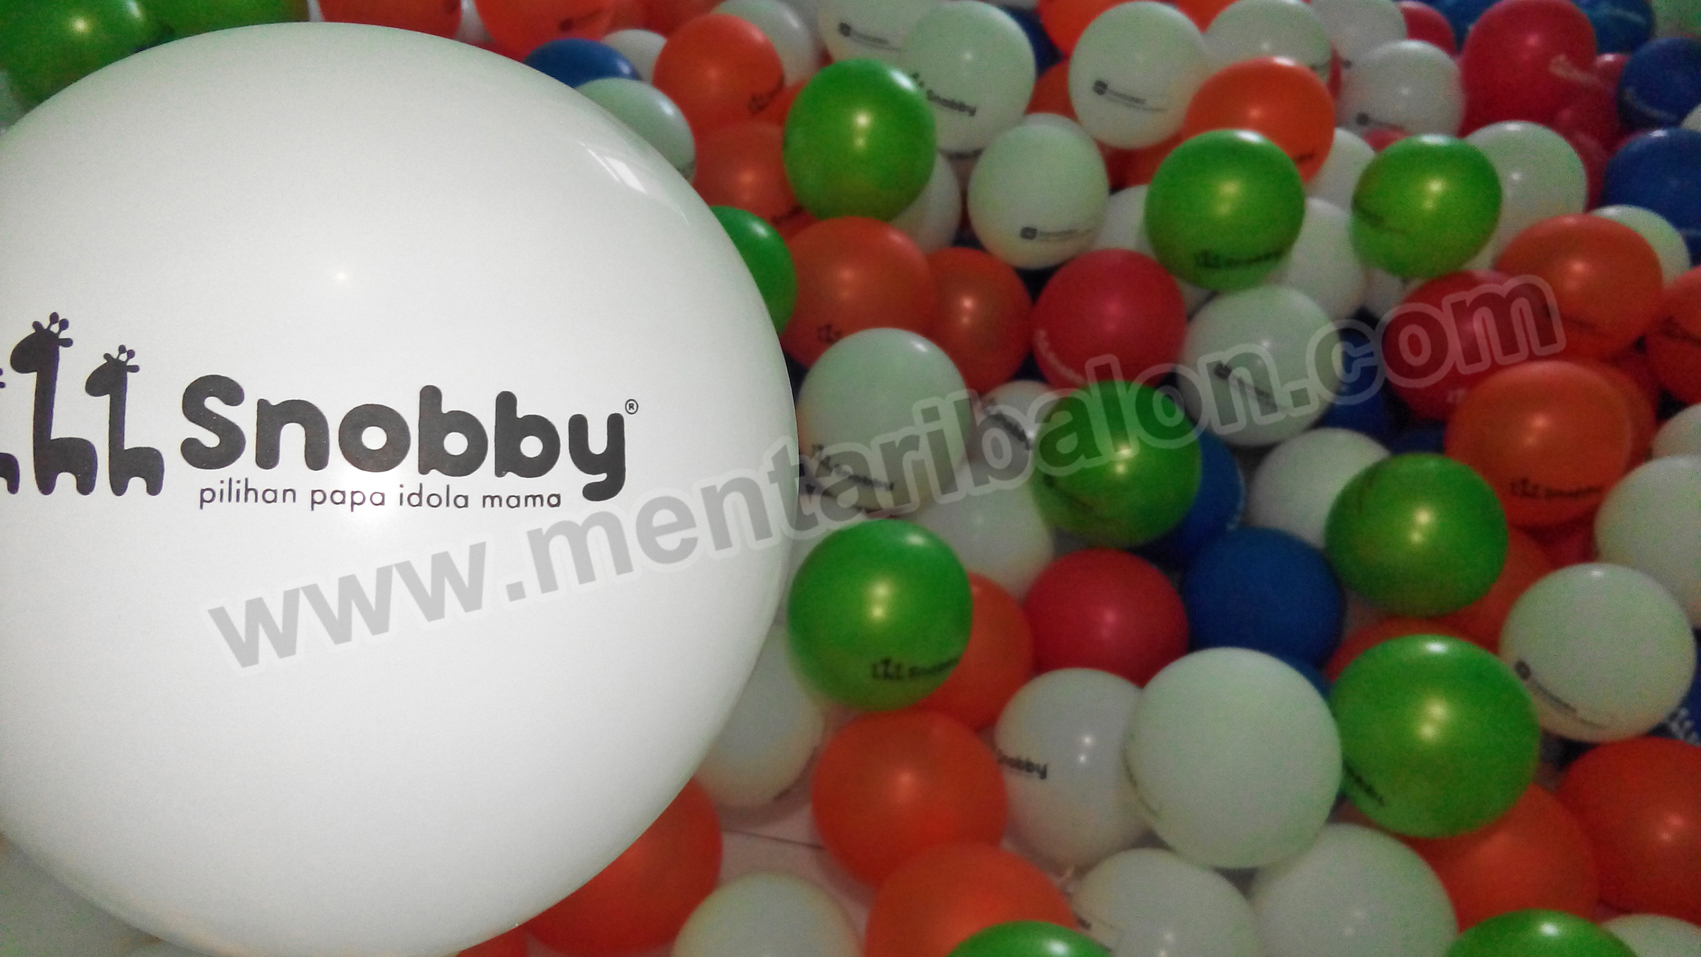 balon print snooby